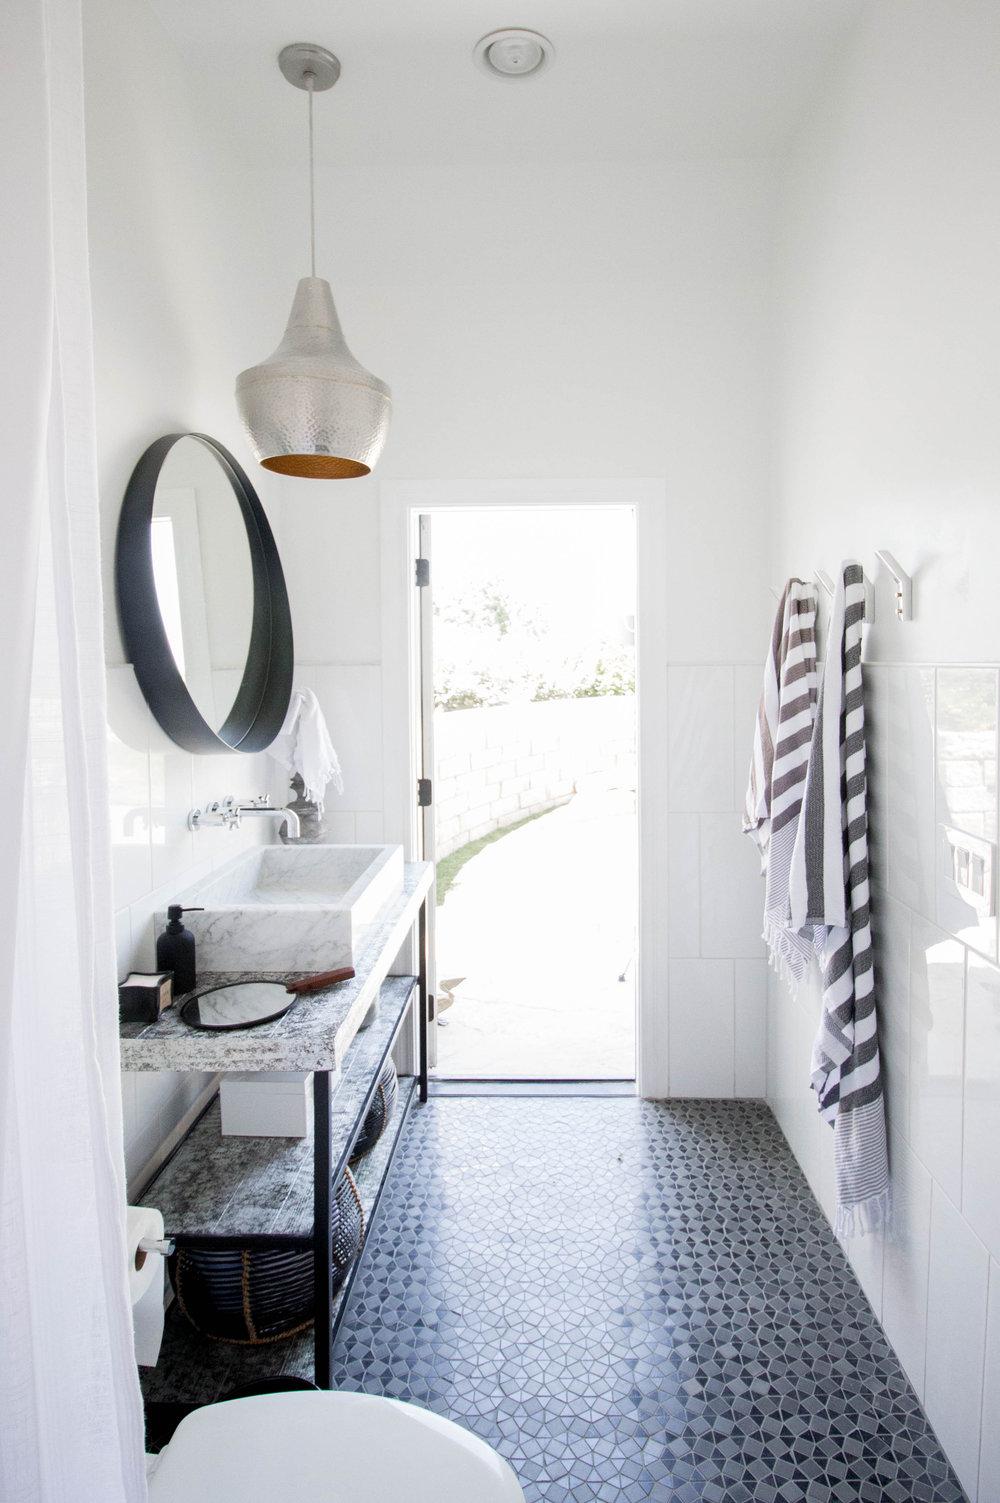 KOA HOUSE_pool bathroom gatsby tile white cb2 crescent mirror hammered silver pendant custom vanity silver leaf 2.jpg